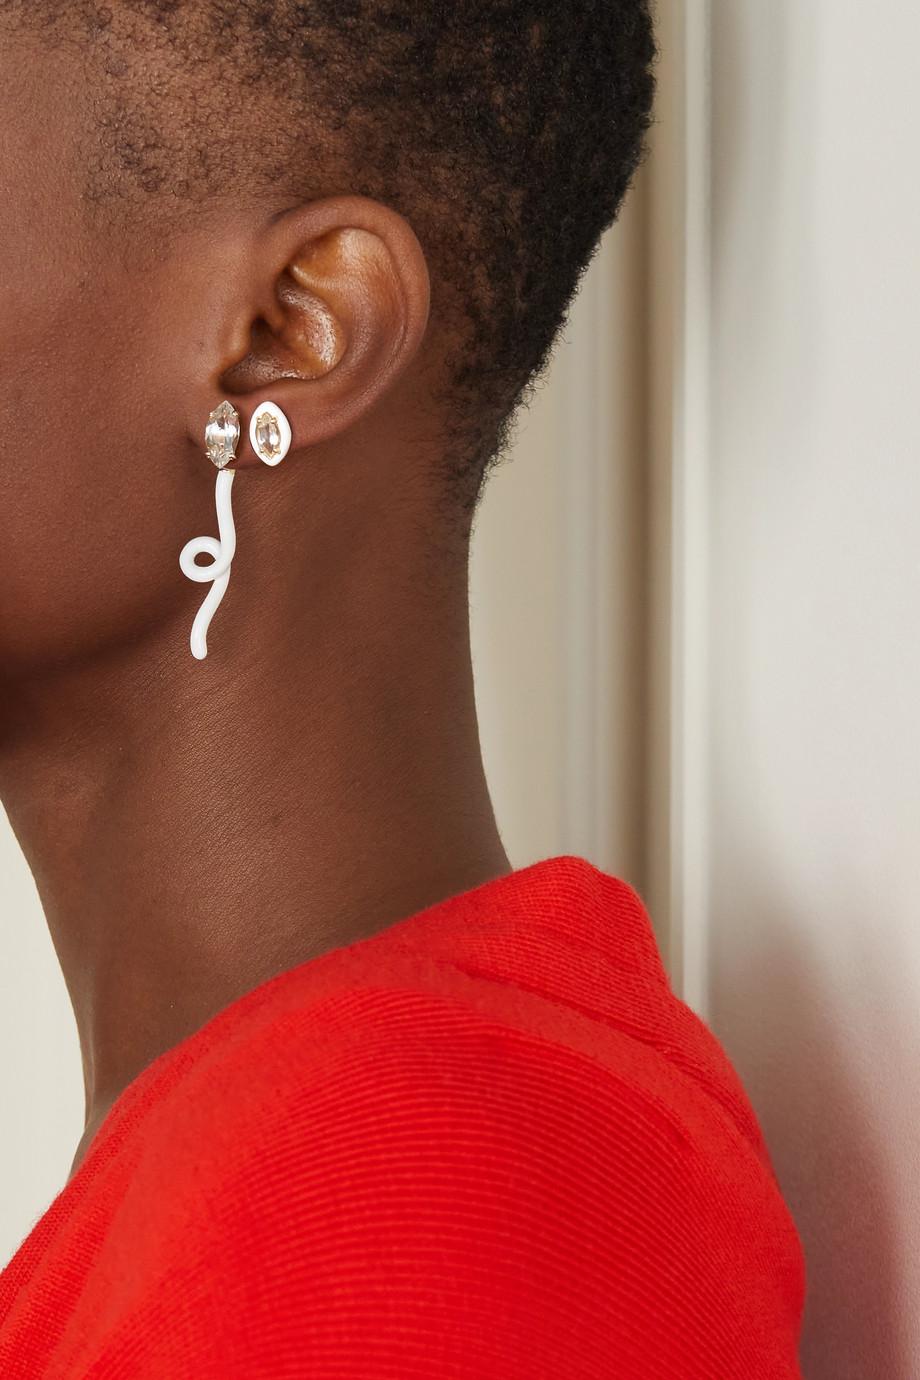 Bea Bongiasca Sweetness gold, enamel and rock crystal earring